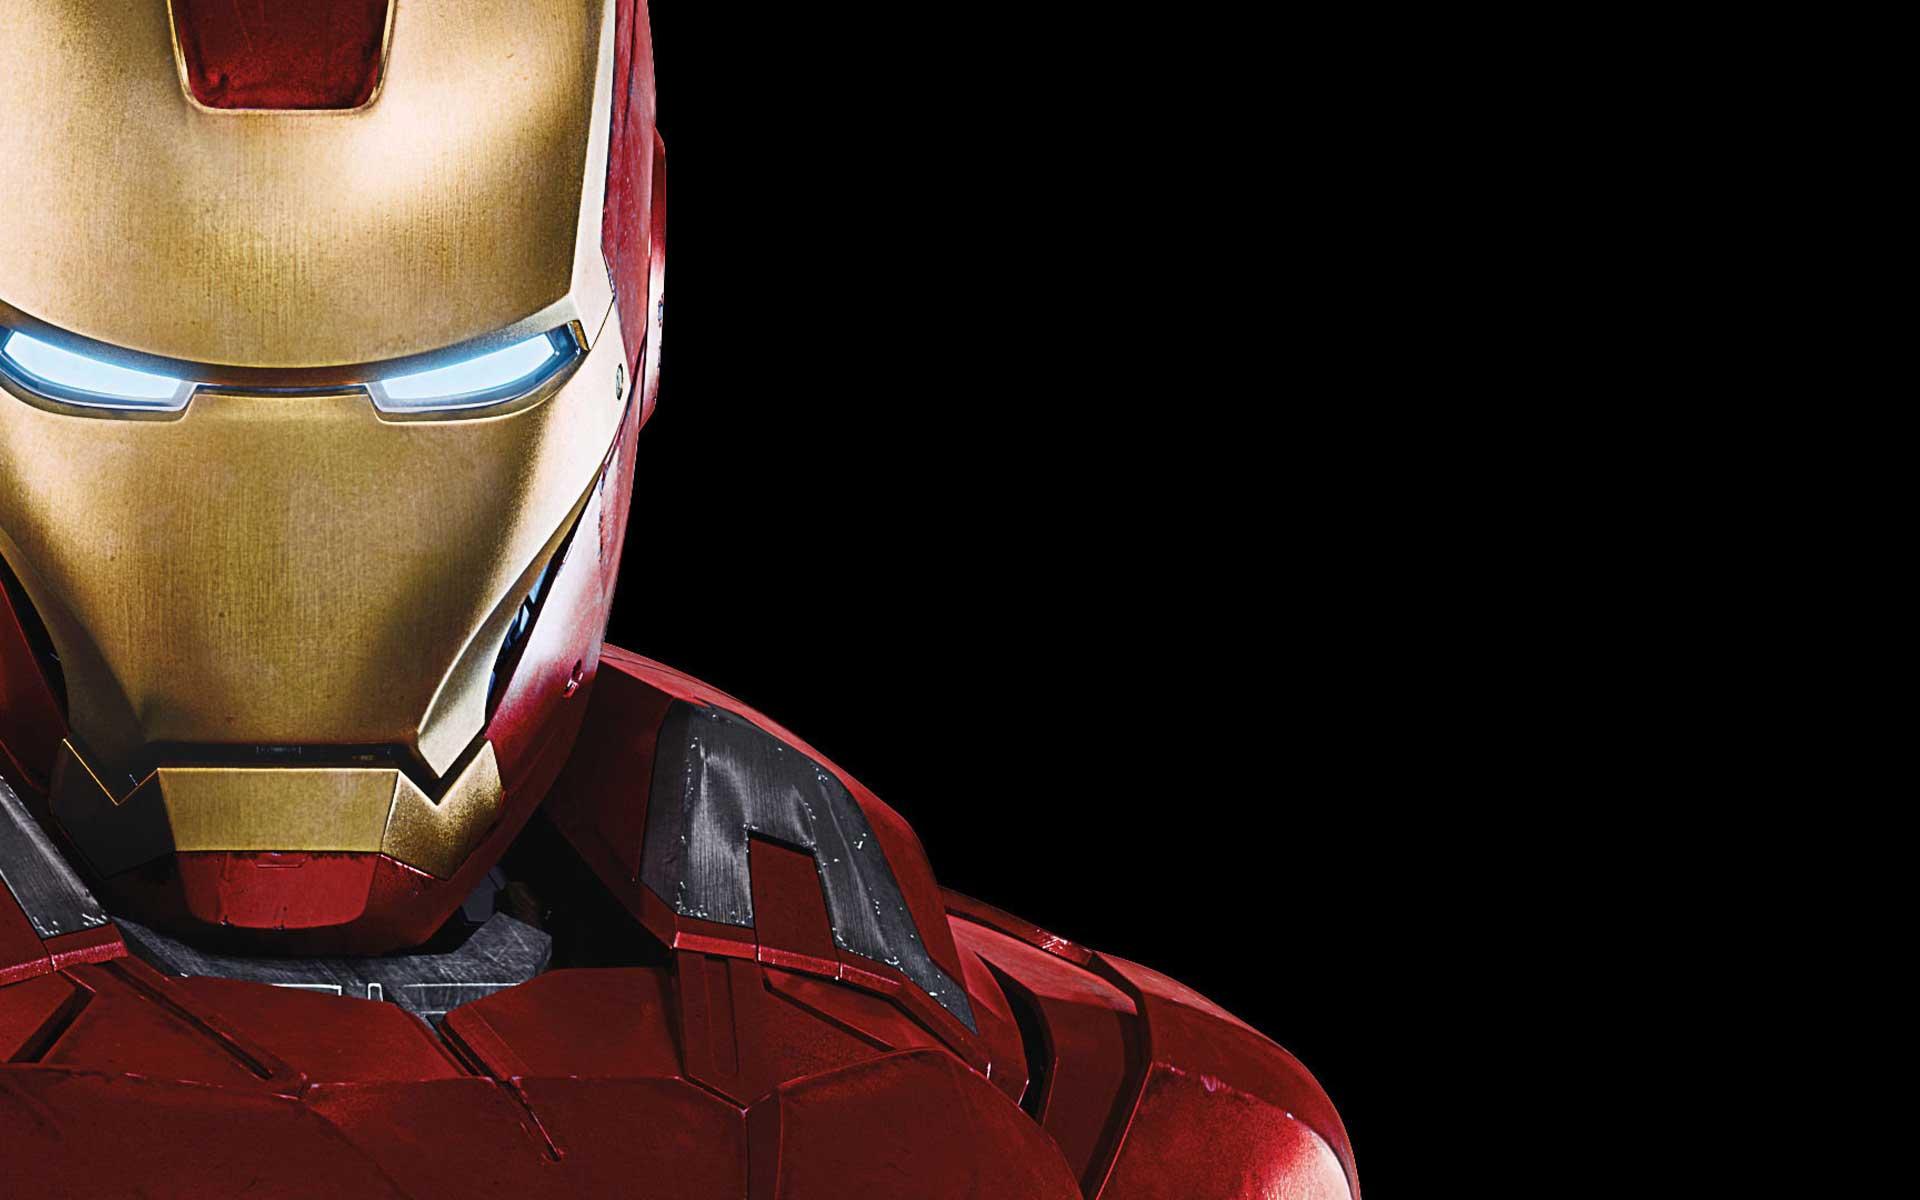 Iron Man Wallpapers Desktop - Wallpaper Cave